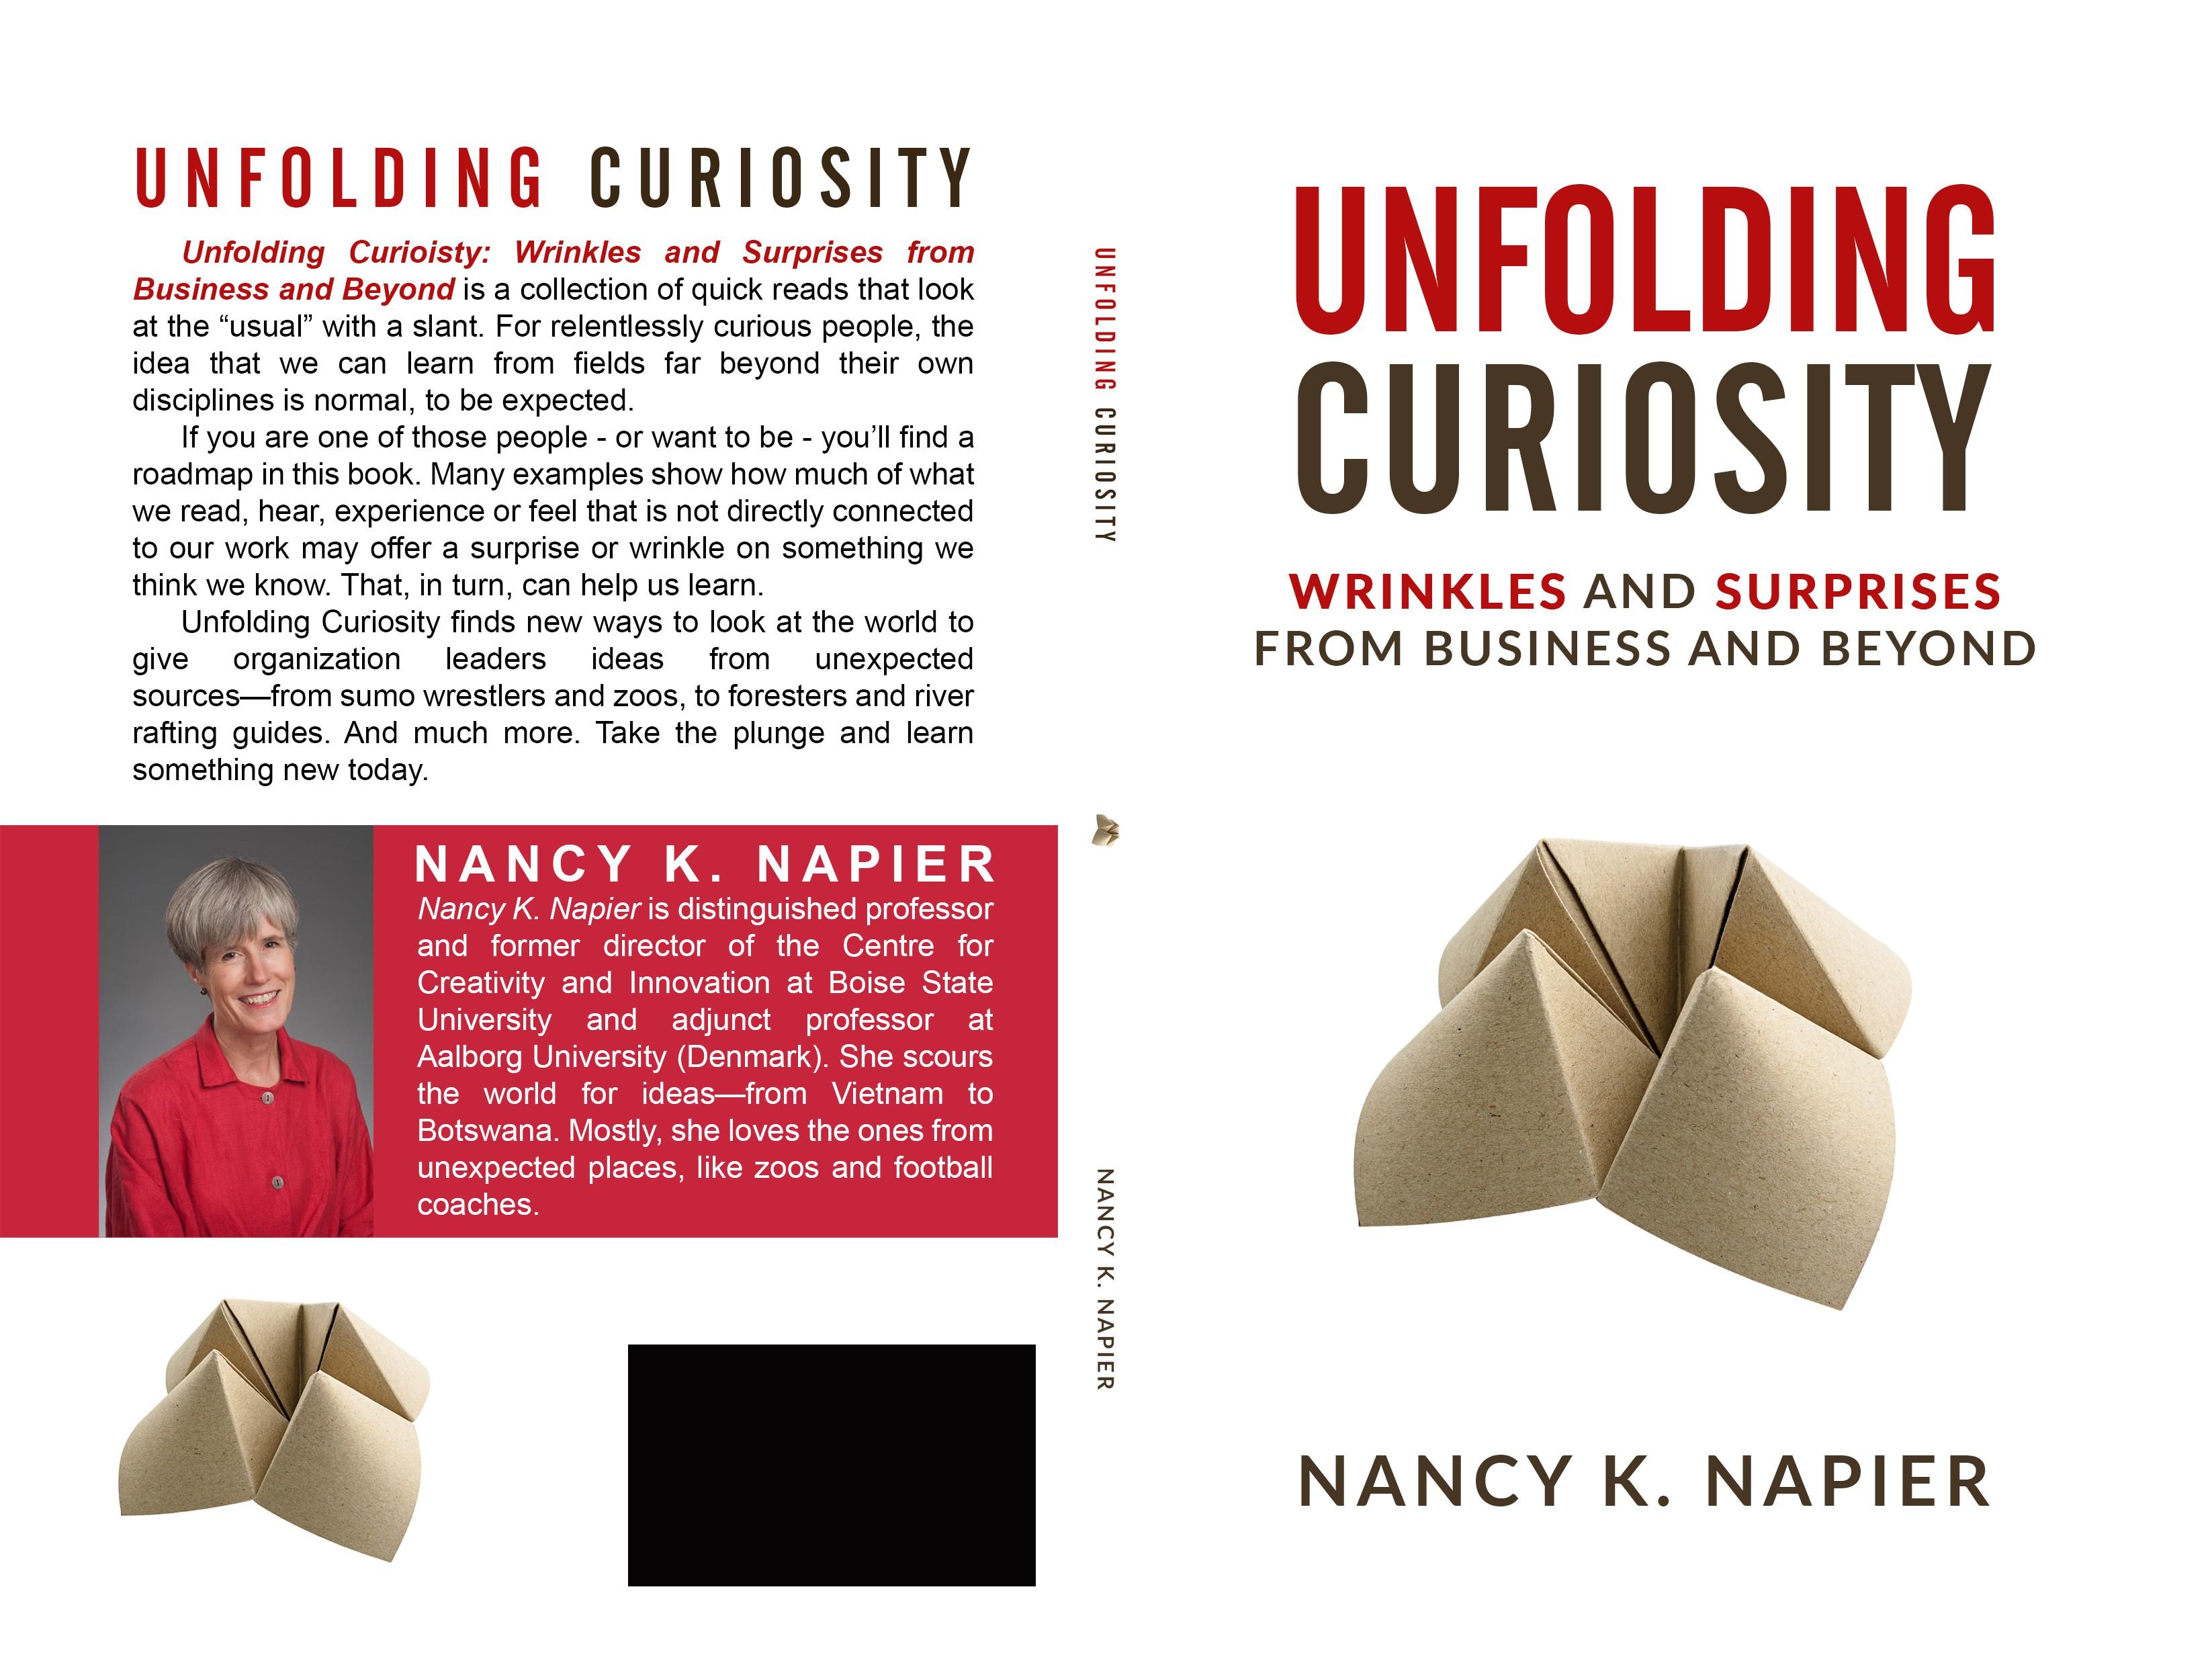 "Design a creative book cover that ""unfolds"" creativity"